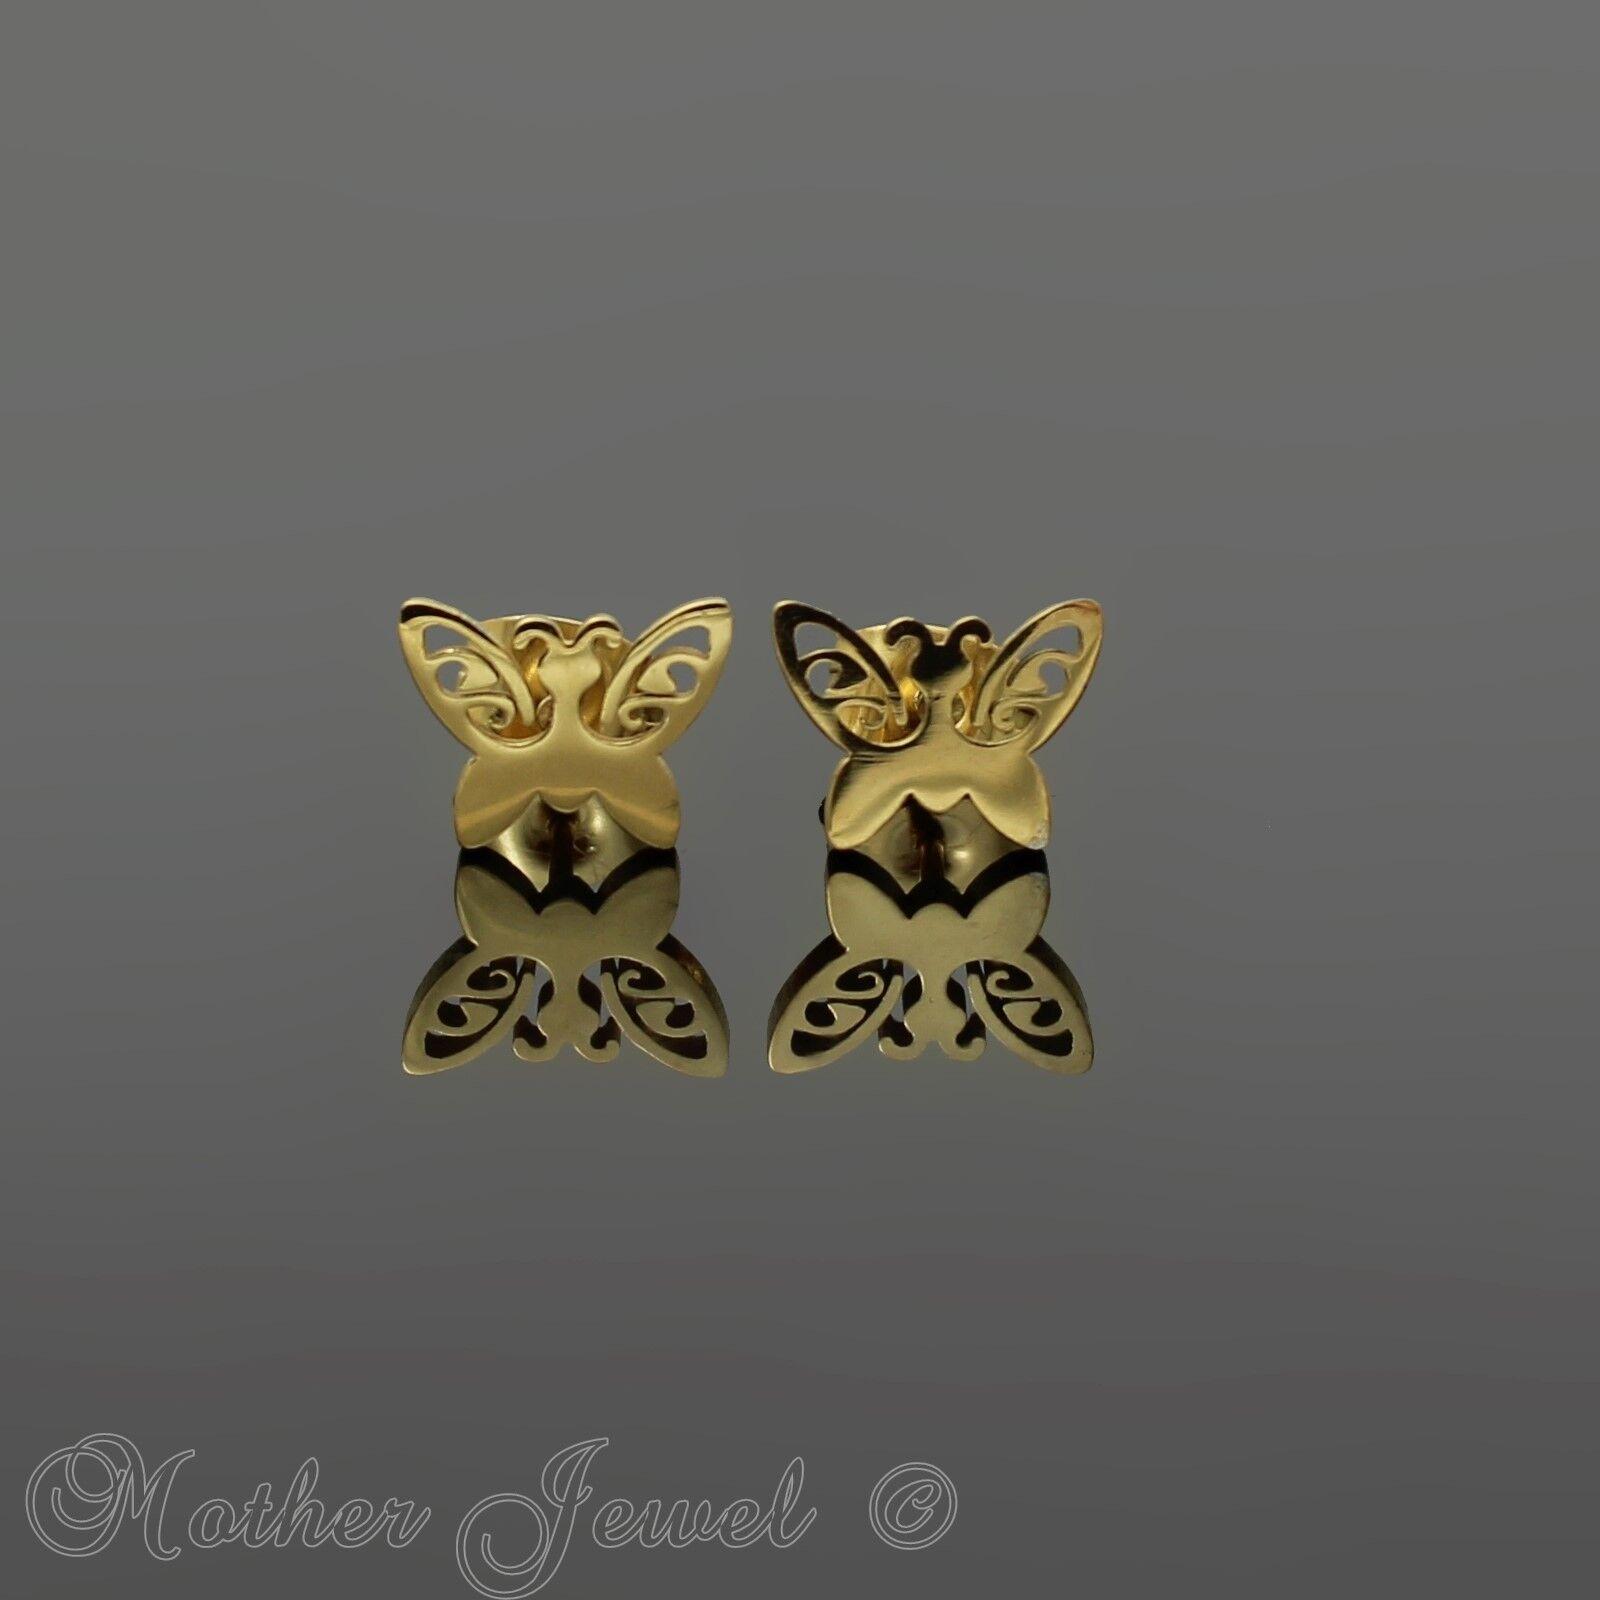 FILIGREE BUTTERFLY ANIMAL STUD YELLOW GOLD TRIPLE PLATED WOMENS STUD EARRINGS